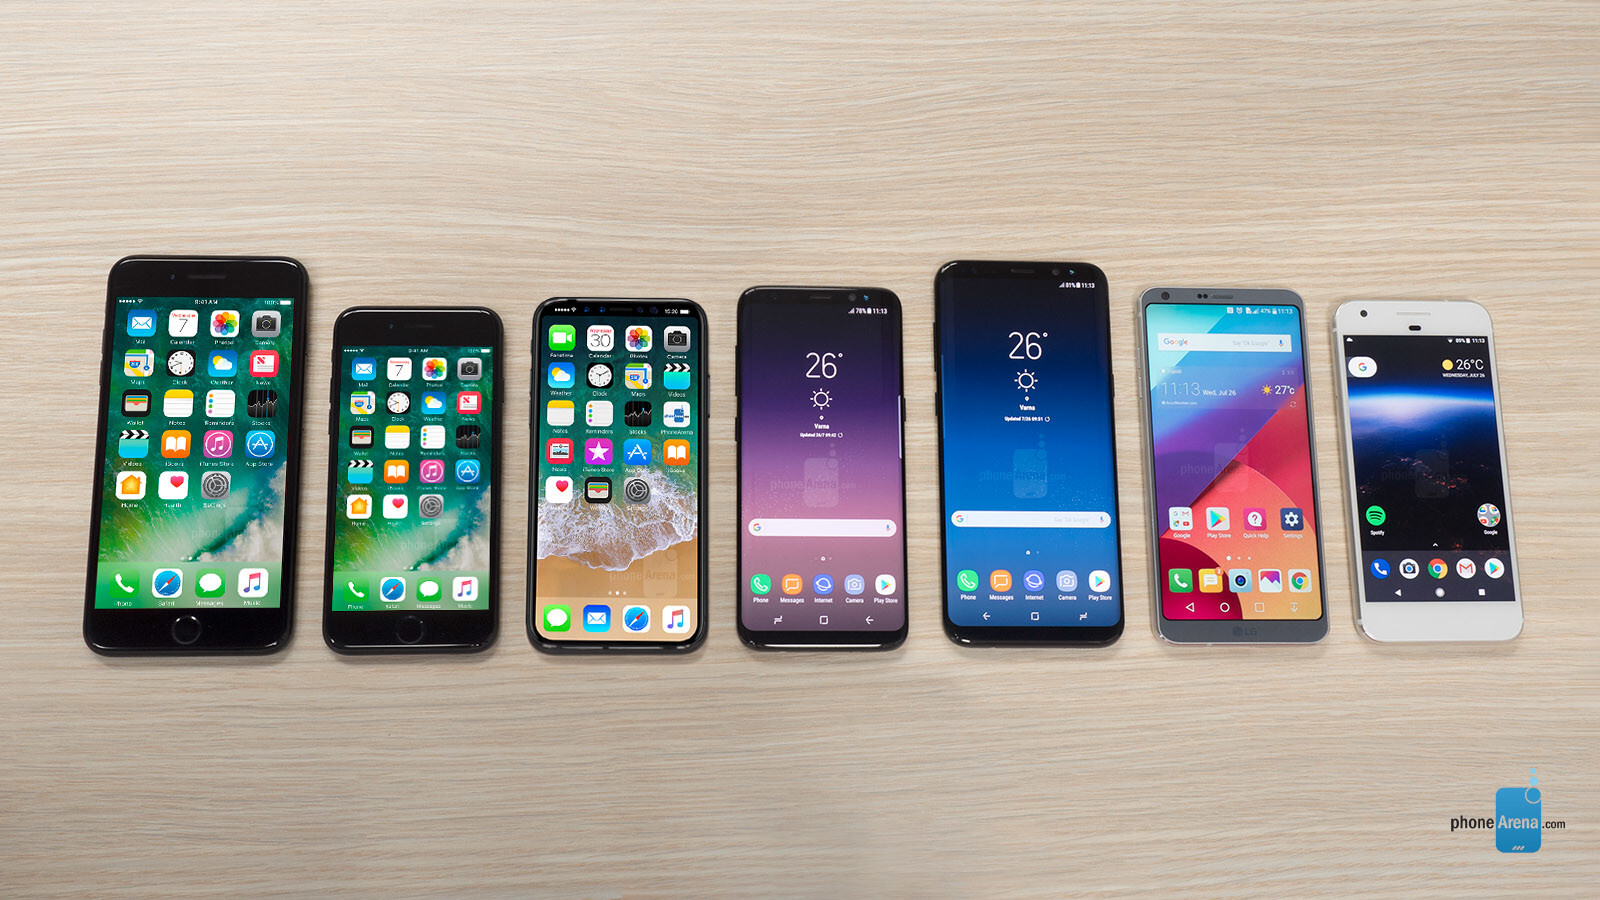 Perché Apple iPhone 8 Plus é meglio di Samsung Galaxy S8 Plus?